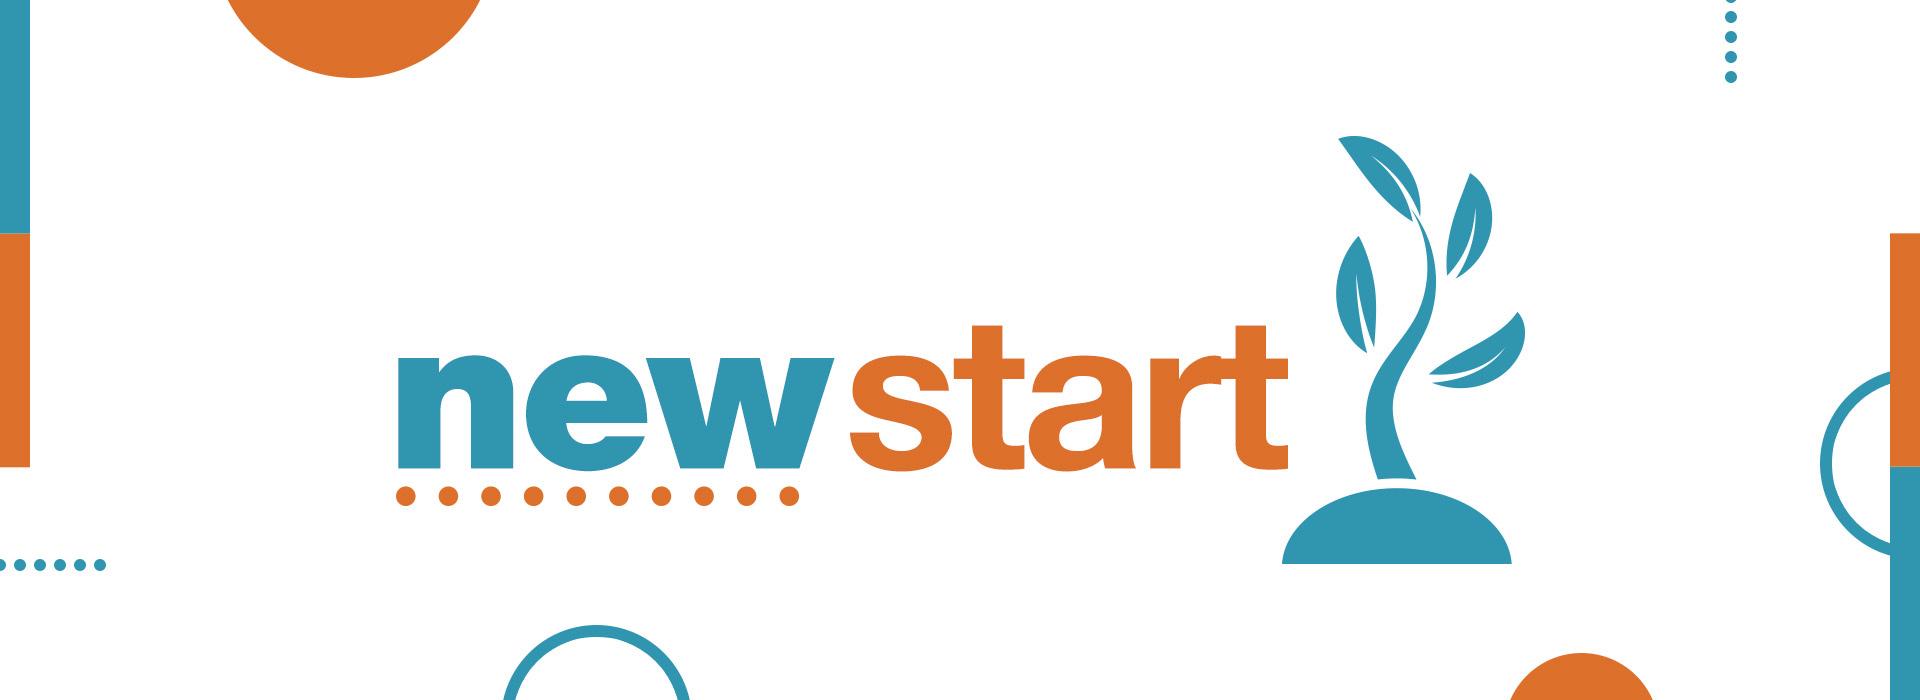 new start believers website banner - 1920x700